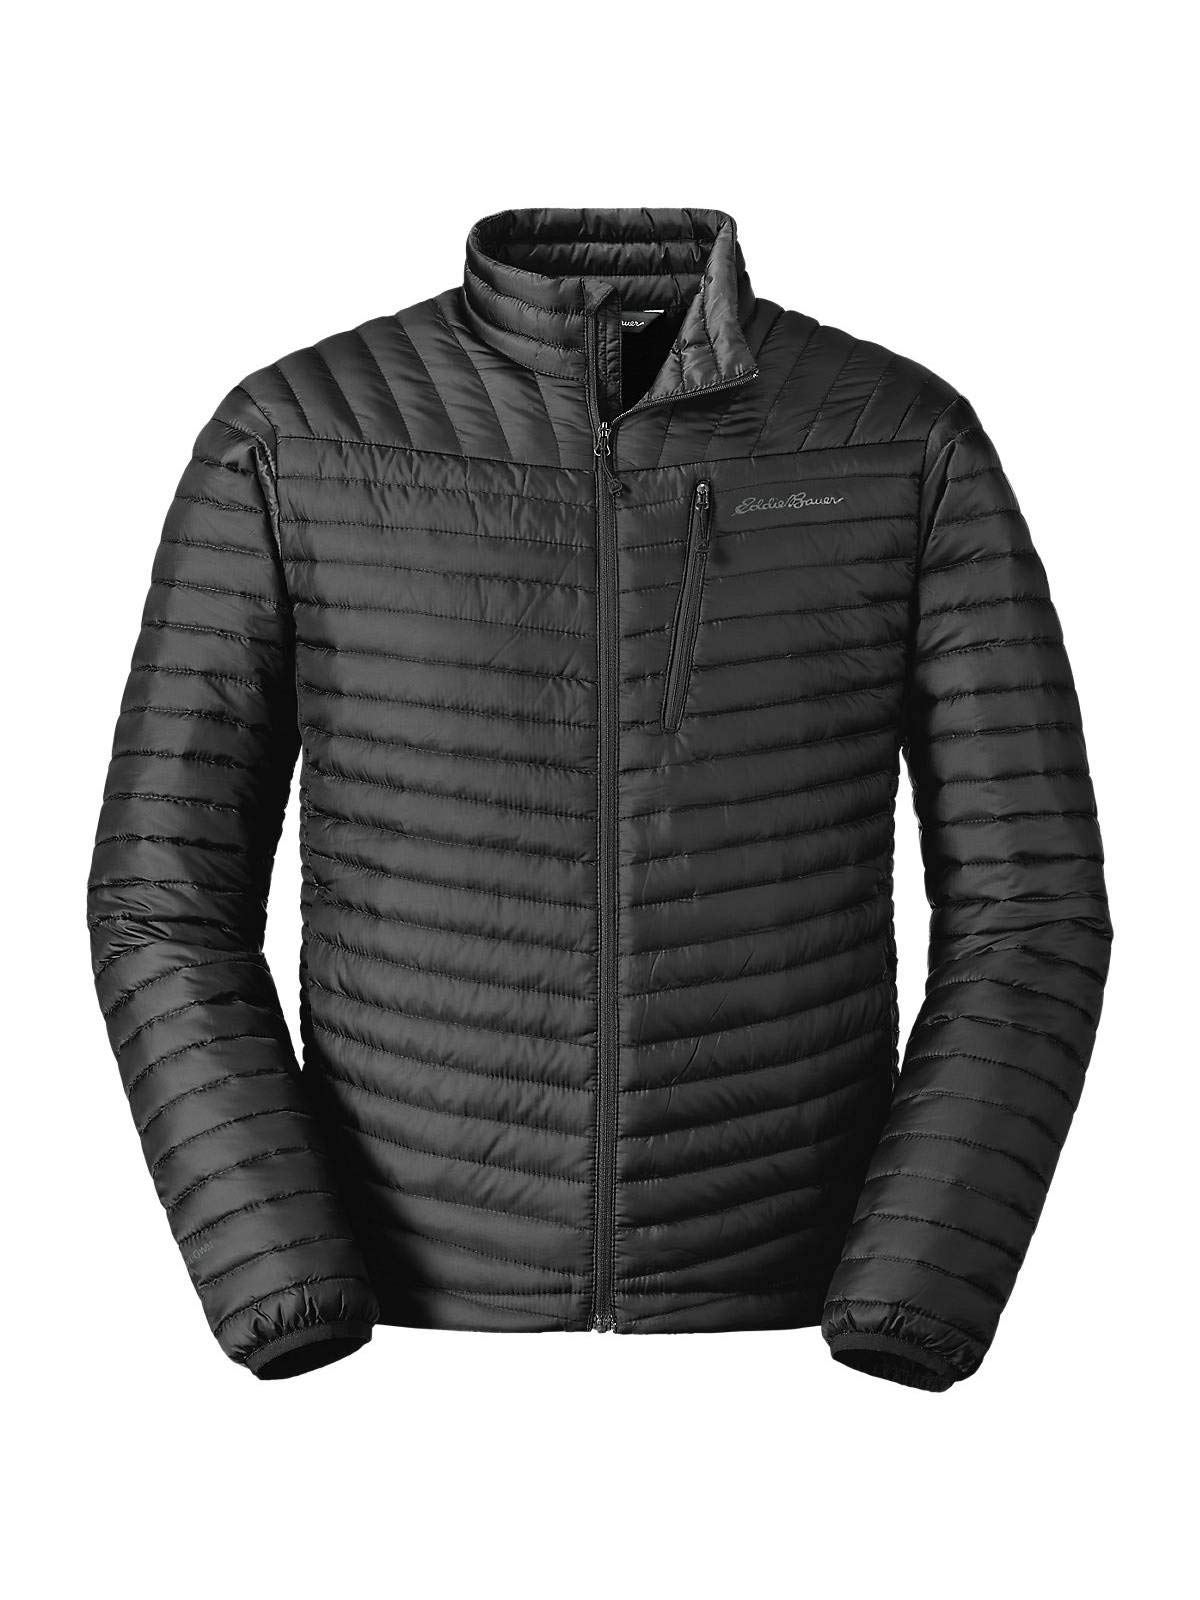 Eddie Bauer Men's MicroTherm 2.0 StormDown Jacket, Black Tall L